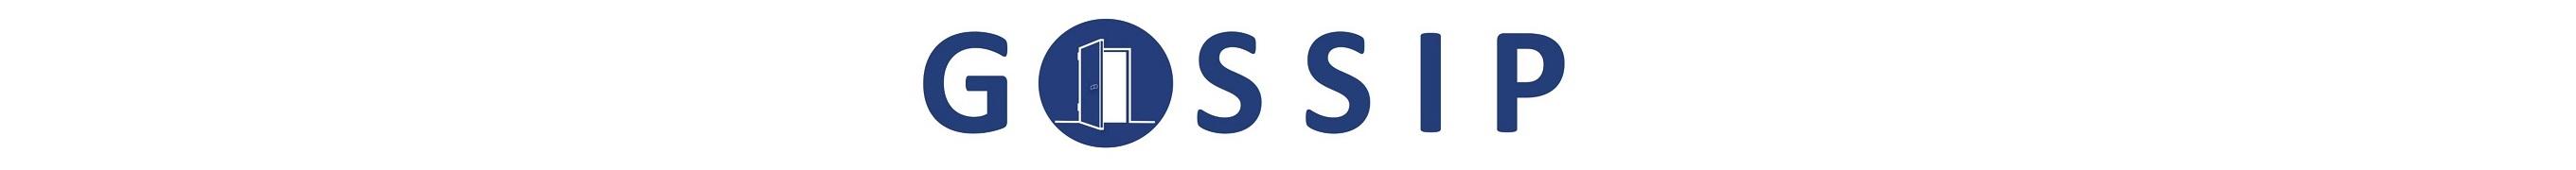 gossip-publikationssystem header image